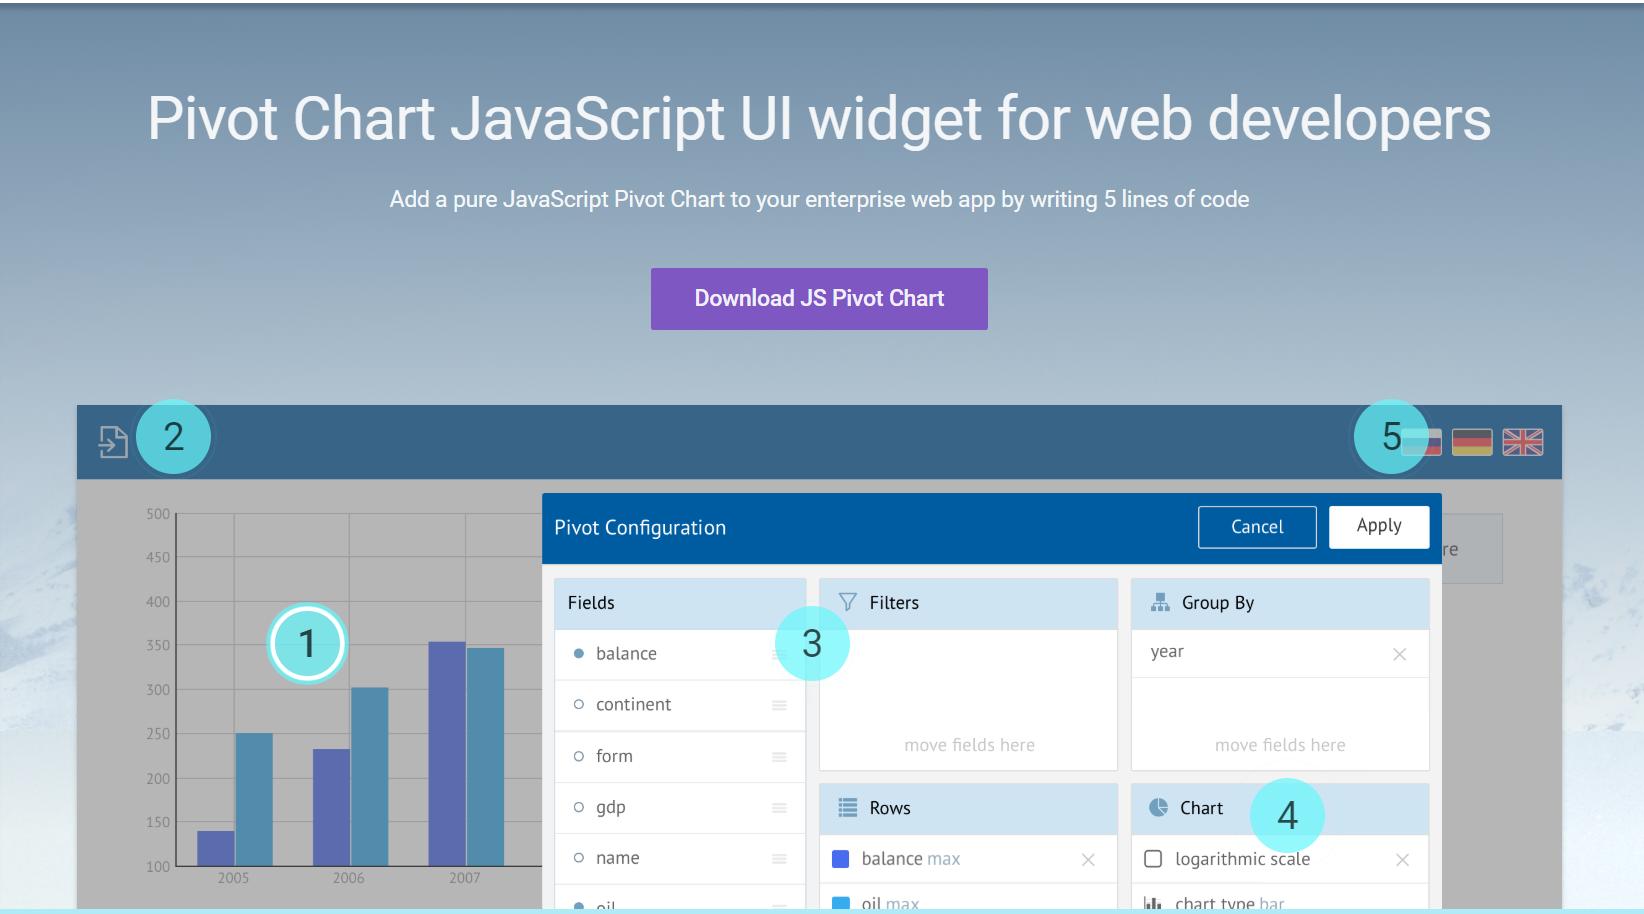 Top 6 UI Widgets for Business Web Applications- Pivot Chart